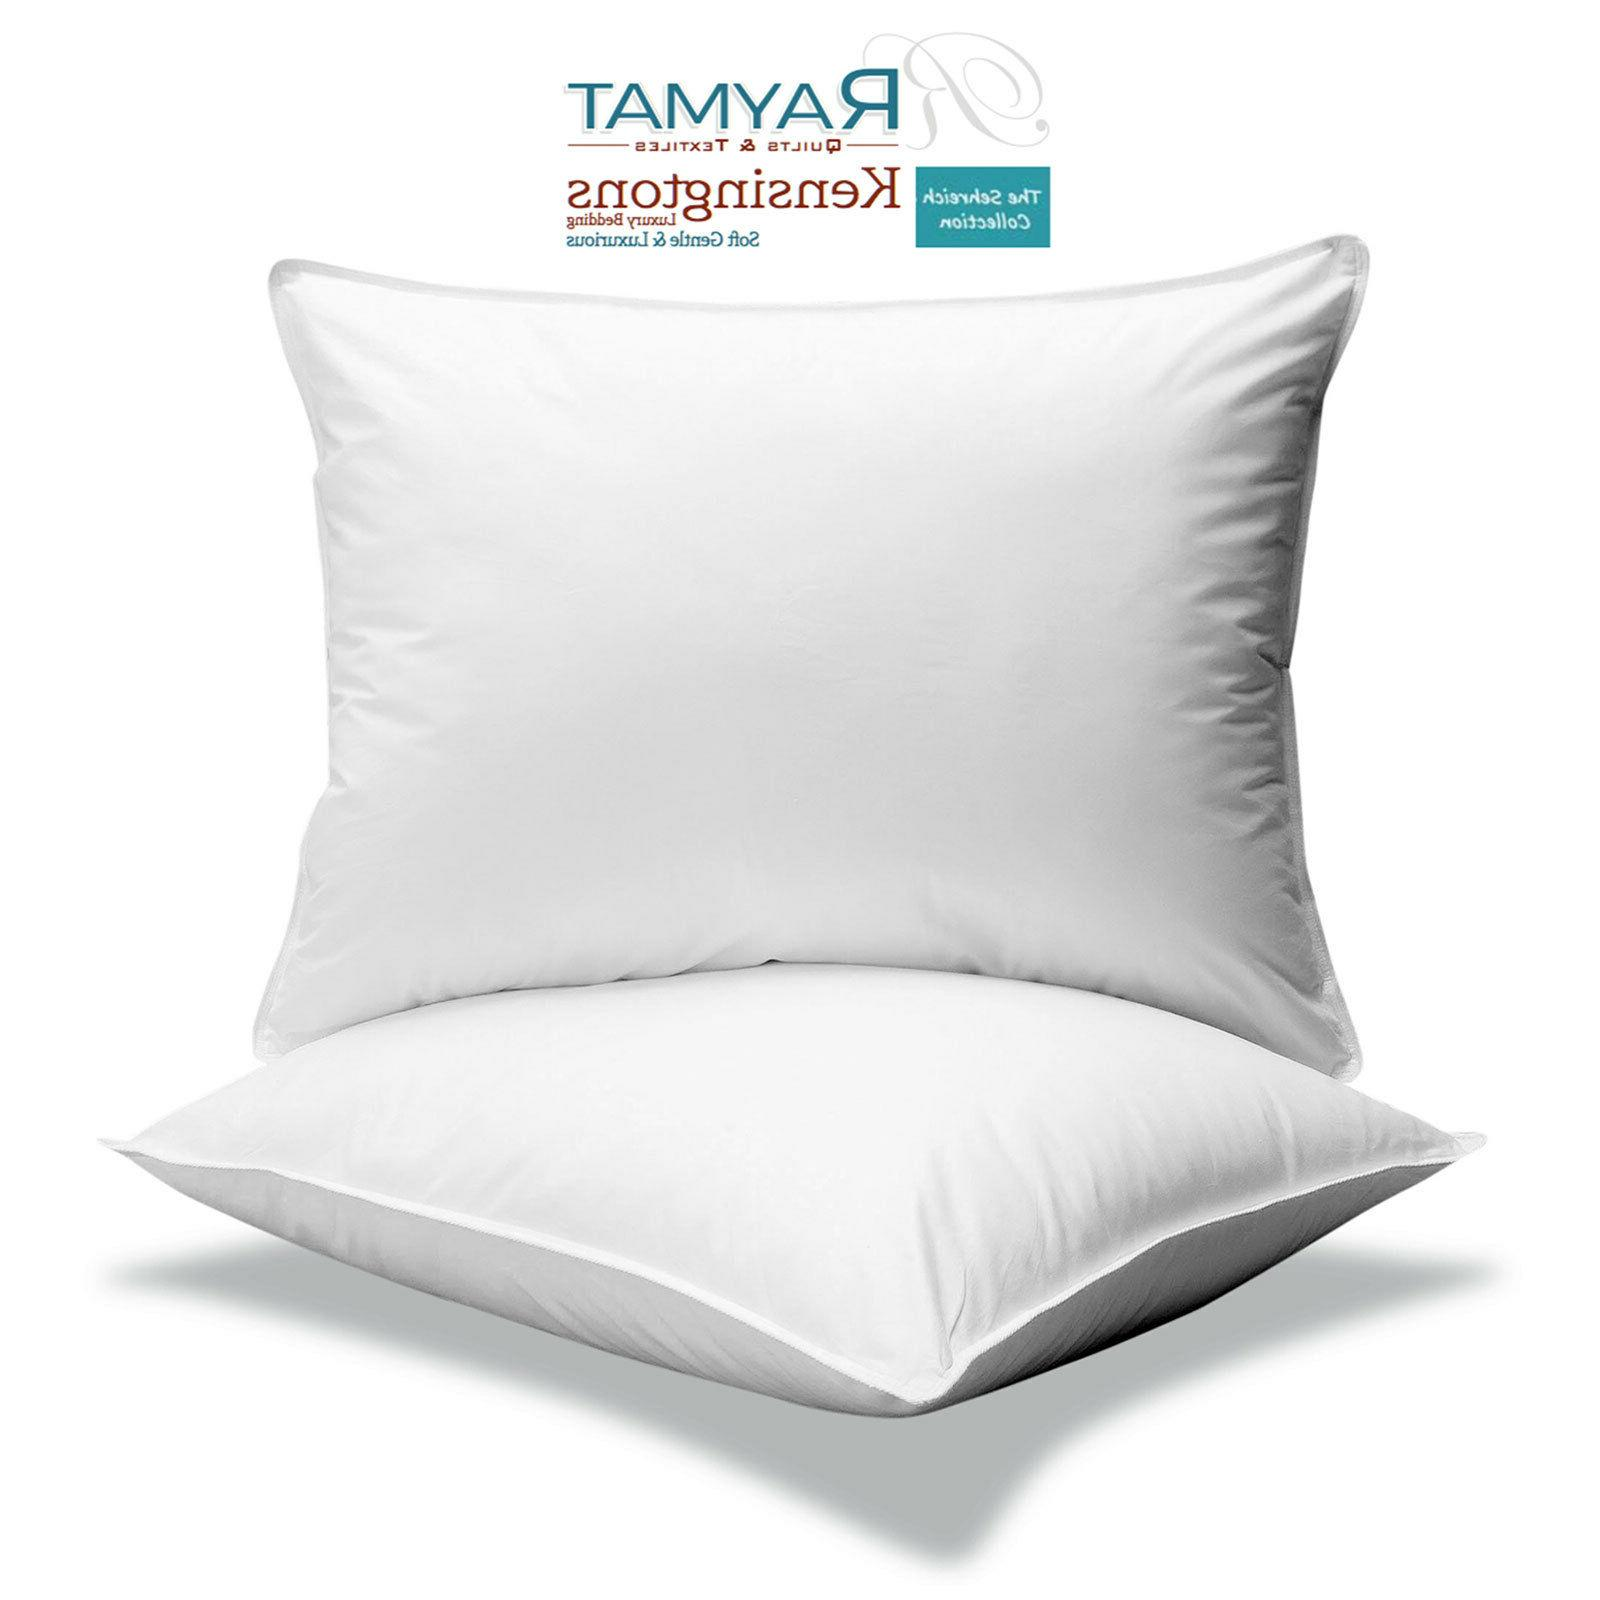 2 x microfibre continental square pillow 65cm